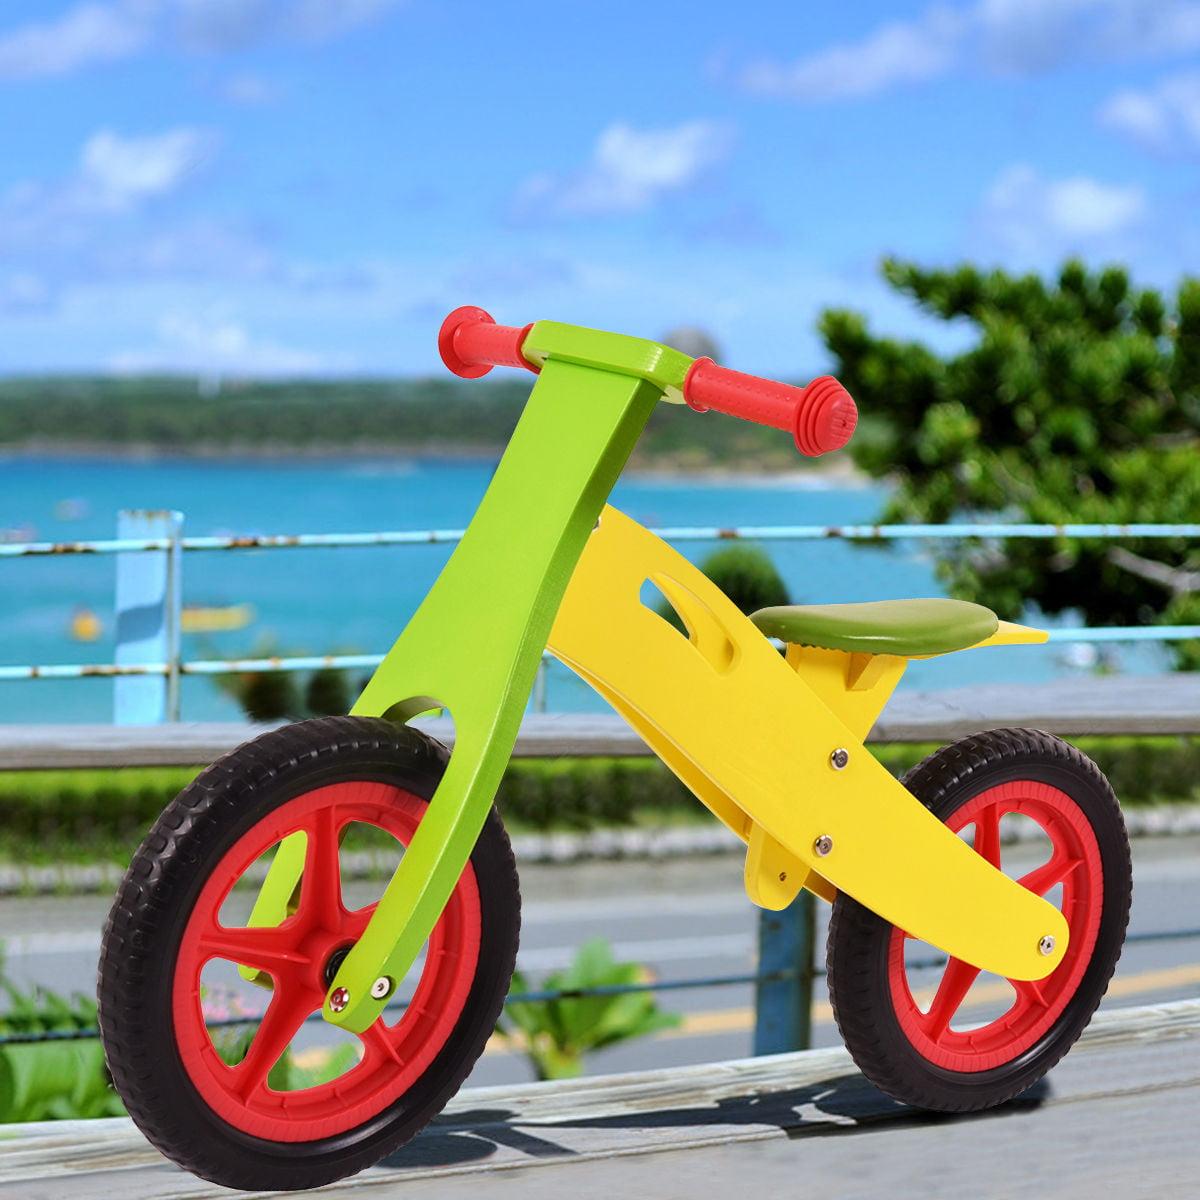 "GHP Green & Yellow 12"" Wheel 66Lbs Capacity Kids Balance Bike with Adjustable Seat"